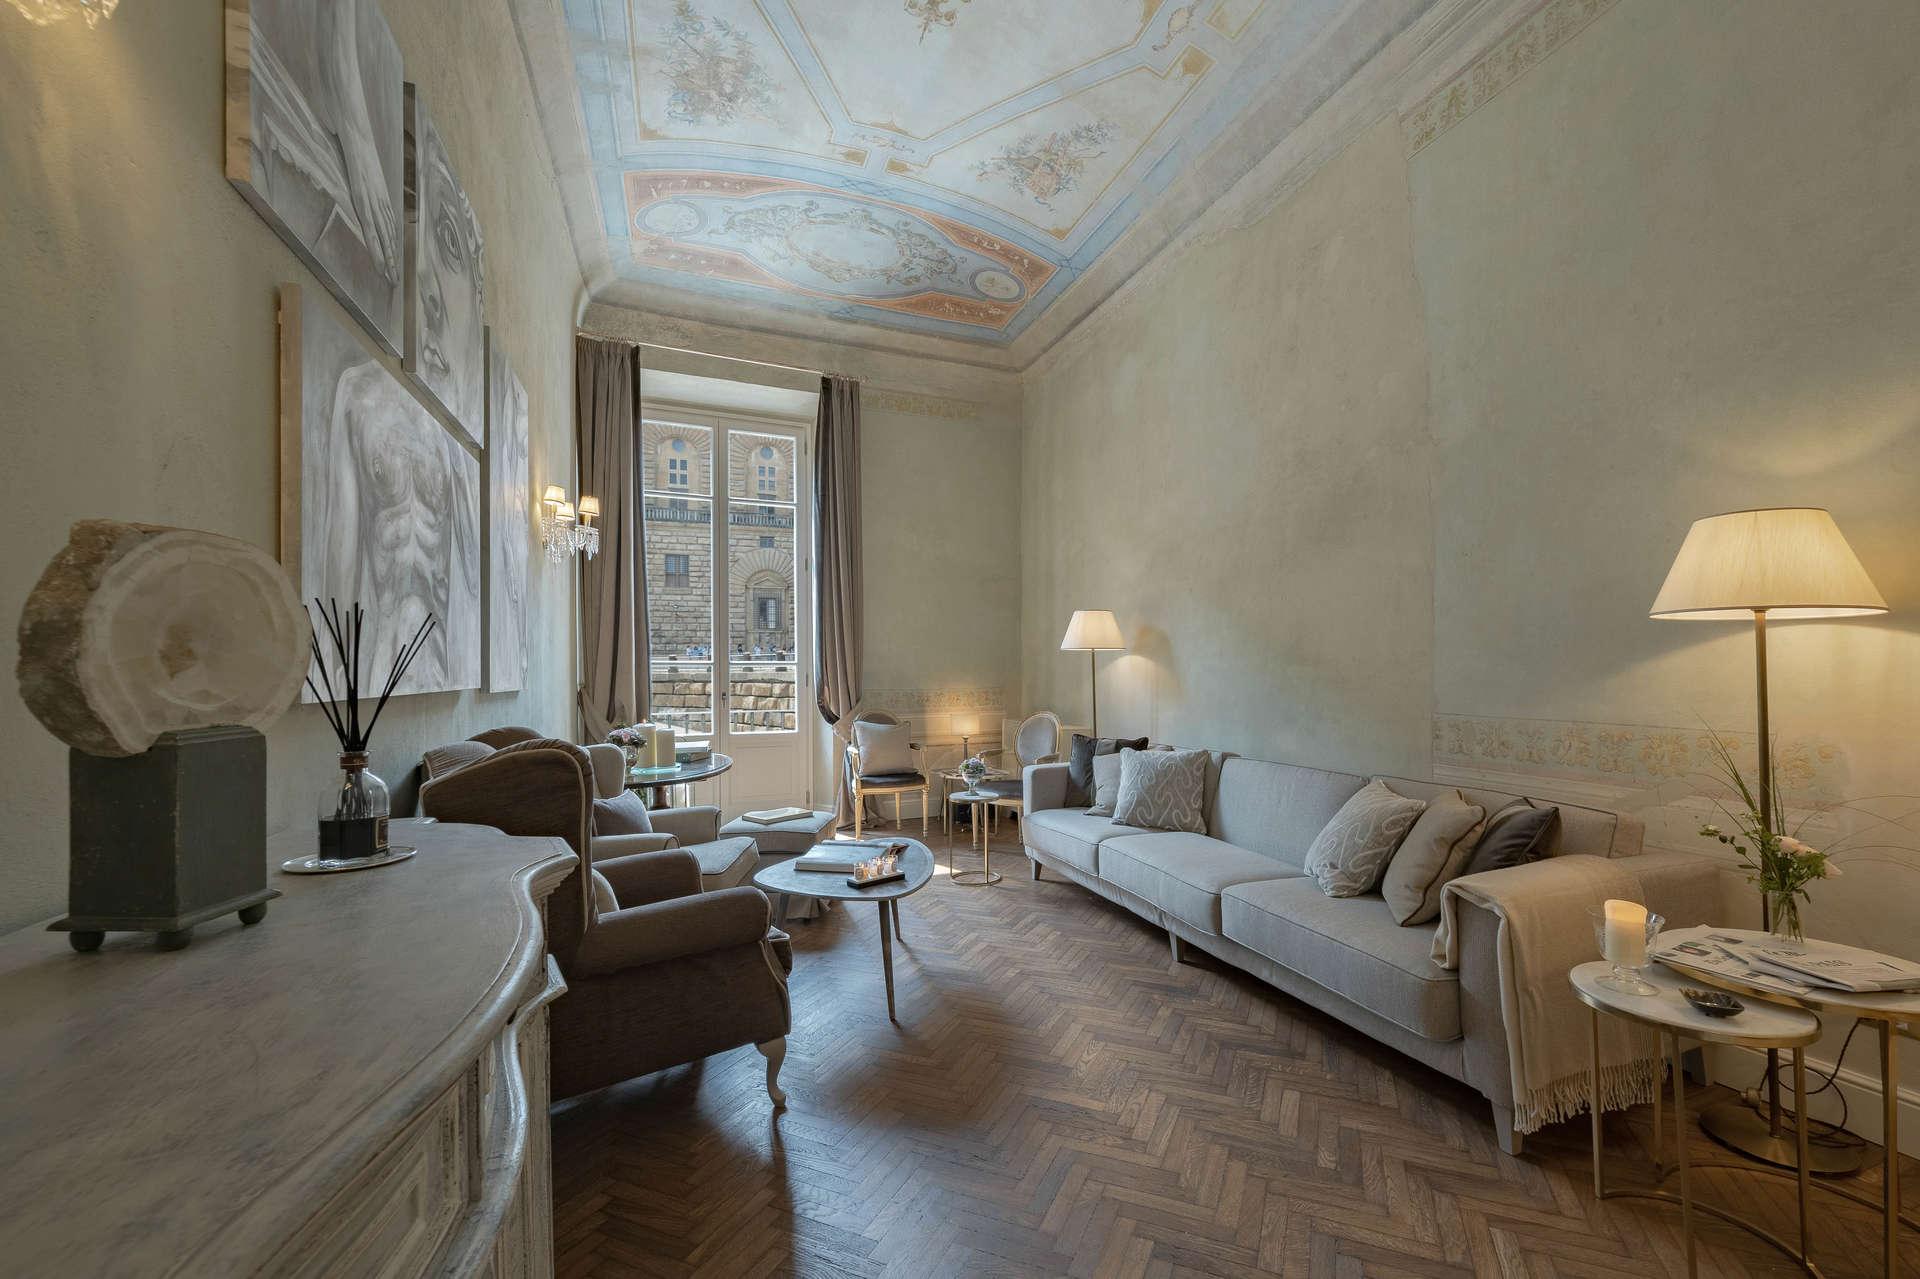 Luxury vacation rentals europe - Italy - Tuscany - Florence - Capital - Image 1/21